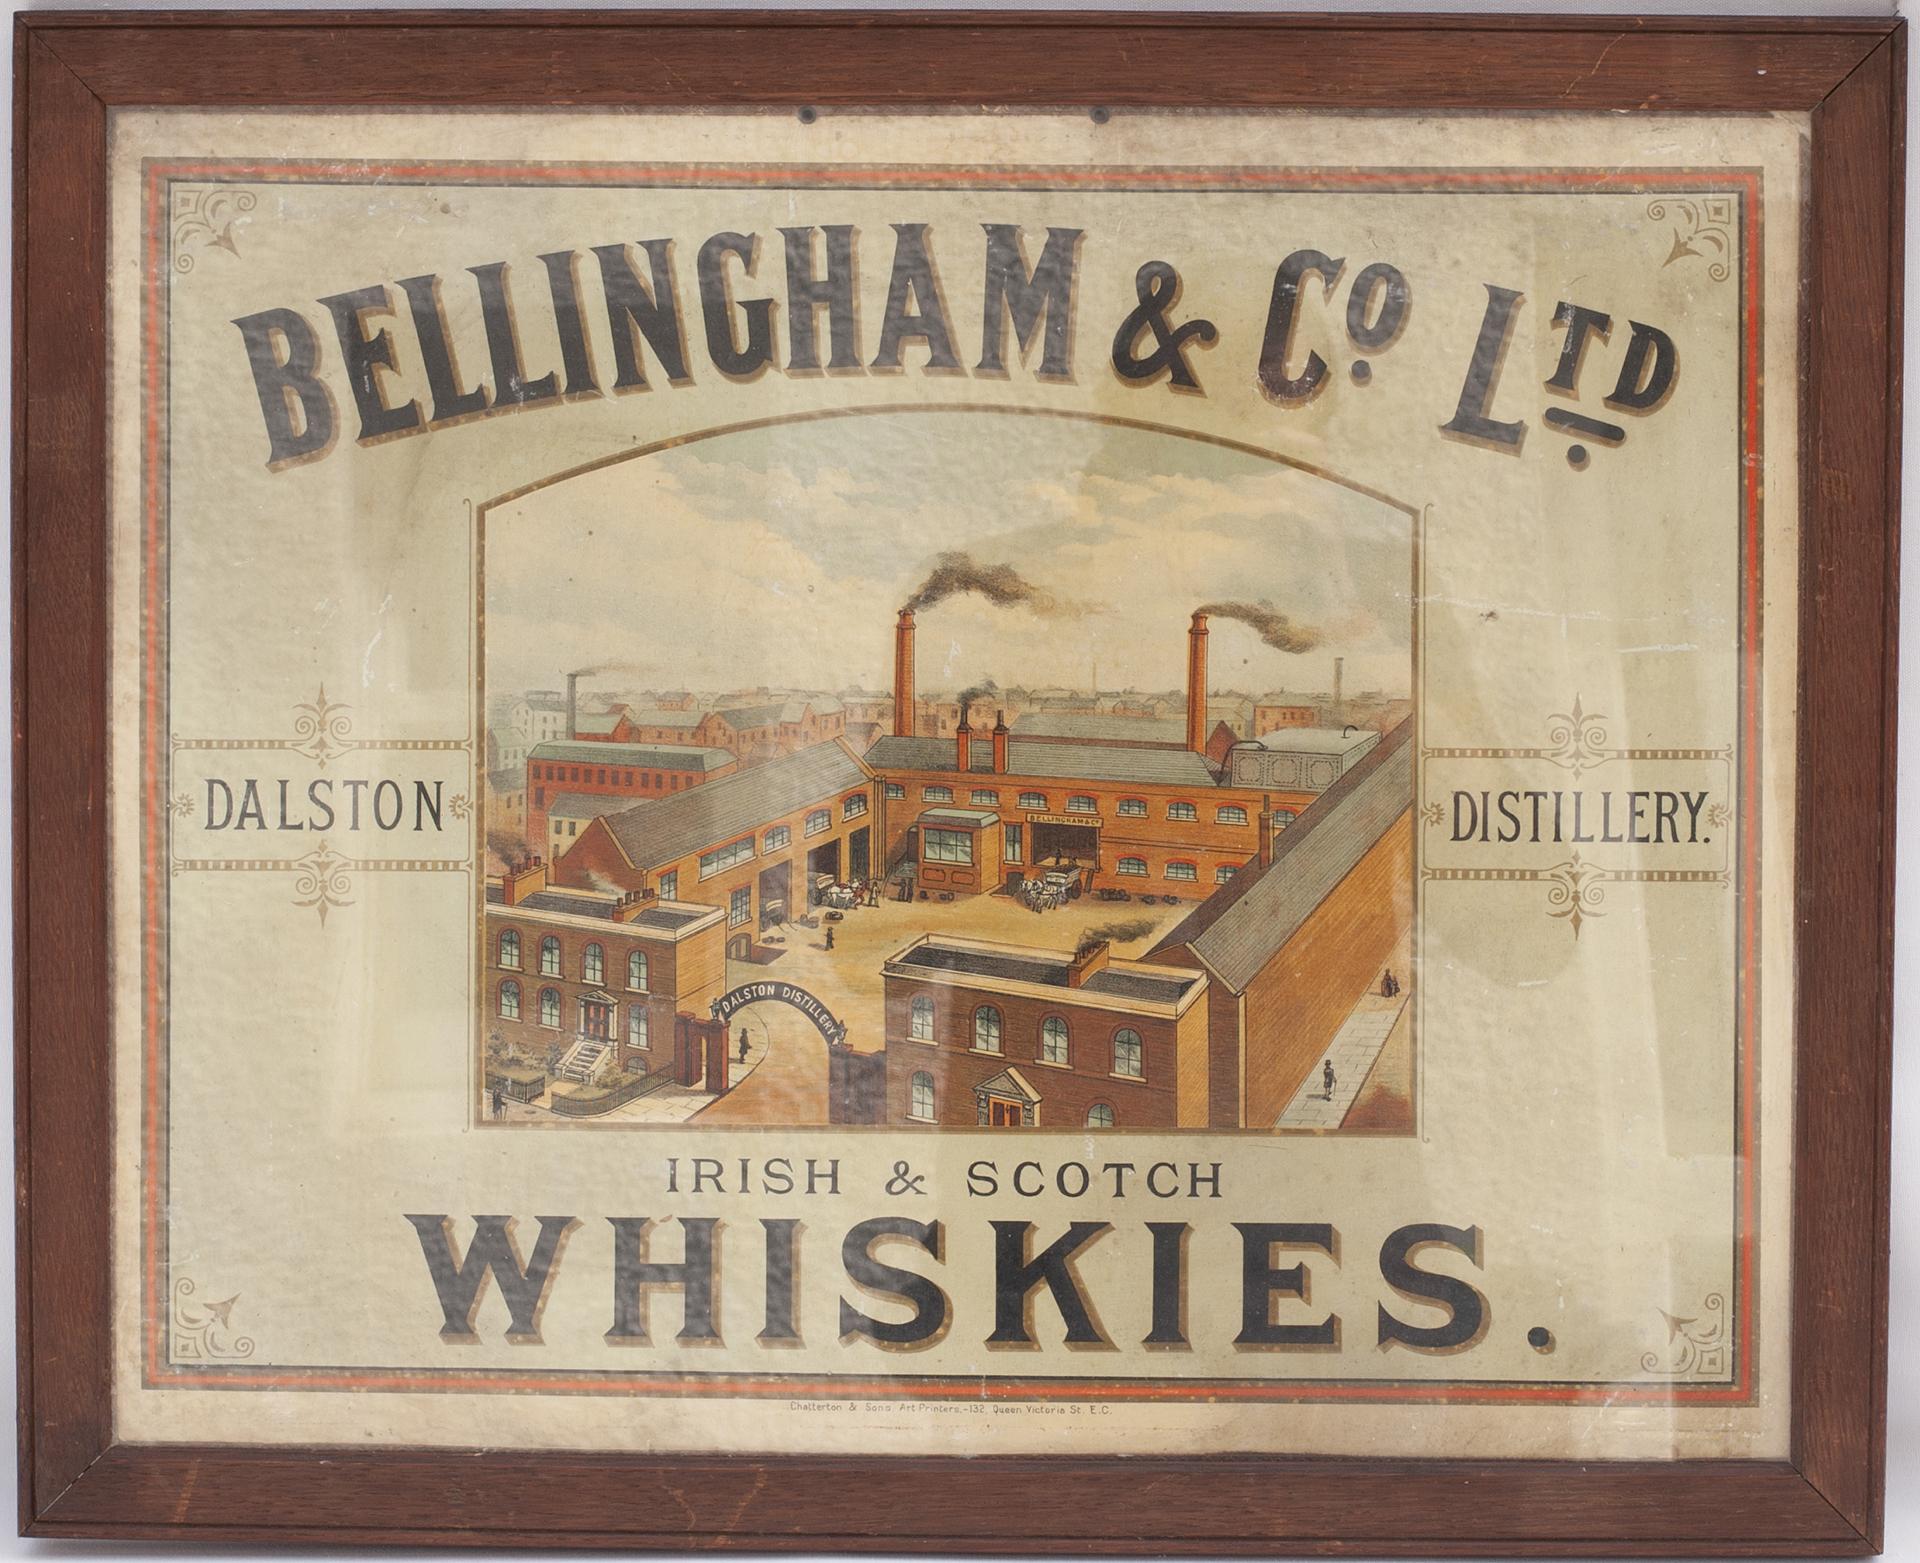 Framed and glazed advertising show card. BELLINGHAM & CO LTD IRISH & SCOTCH WHISKIES DALSTON